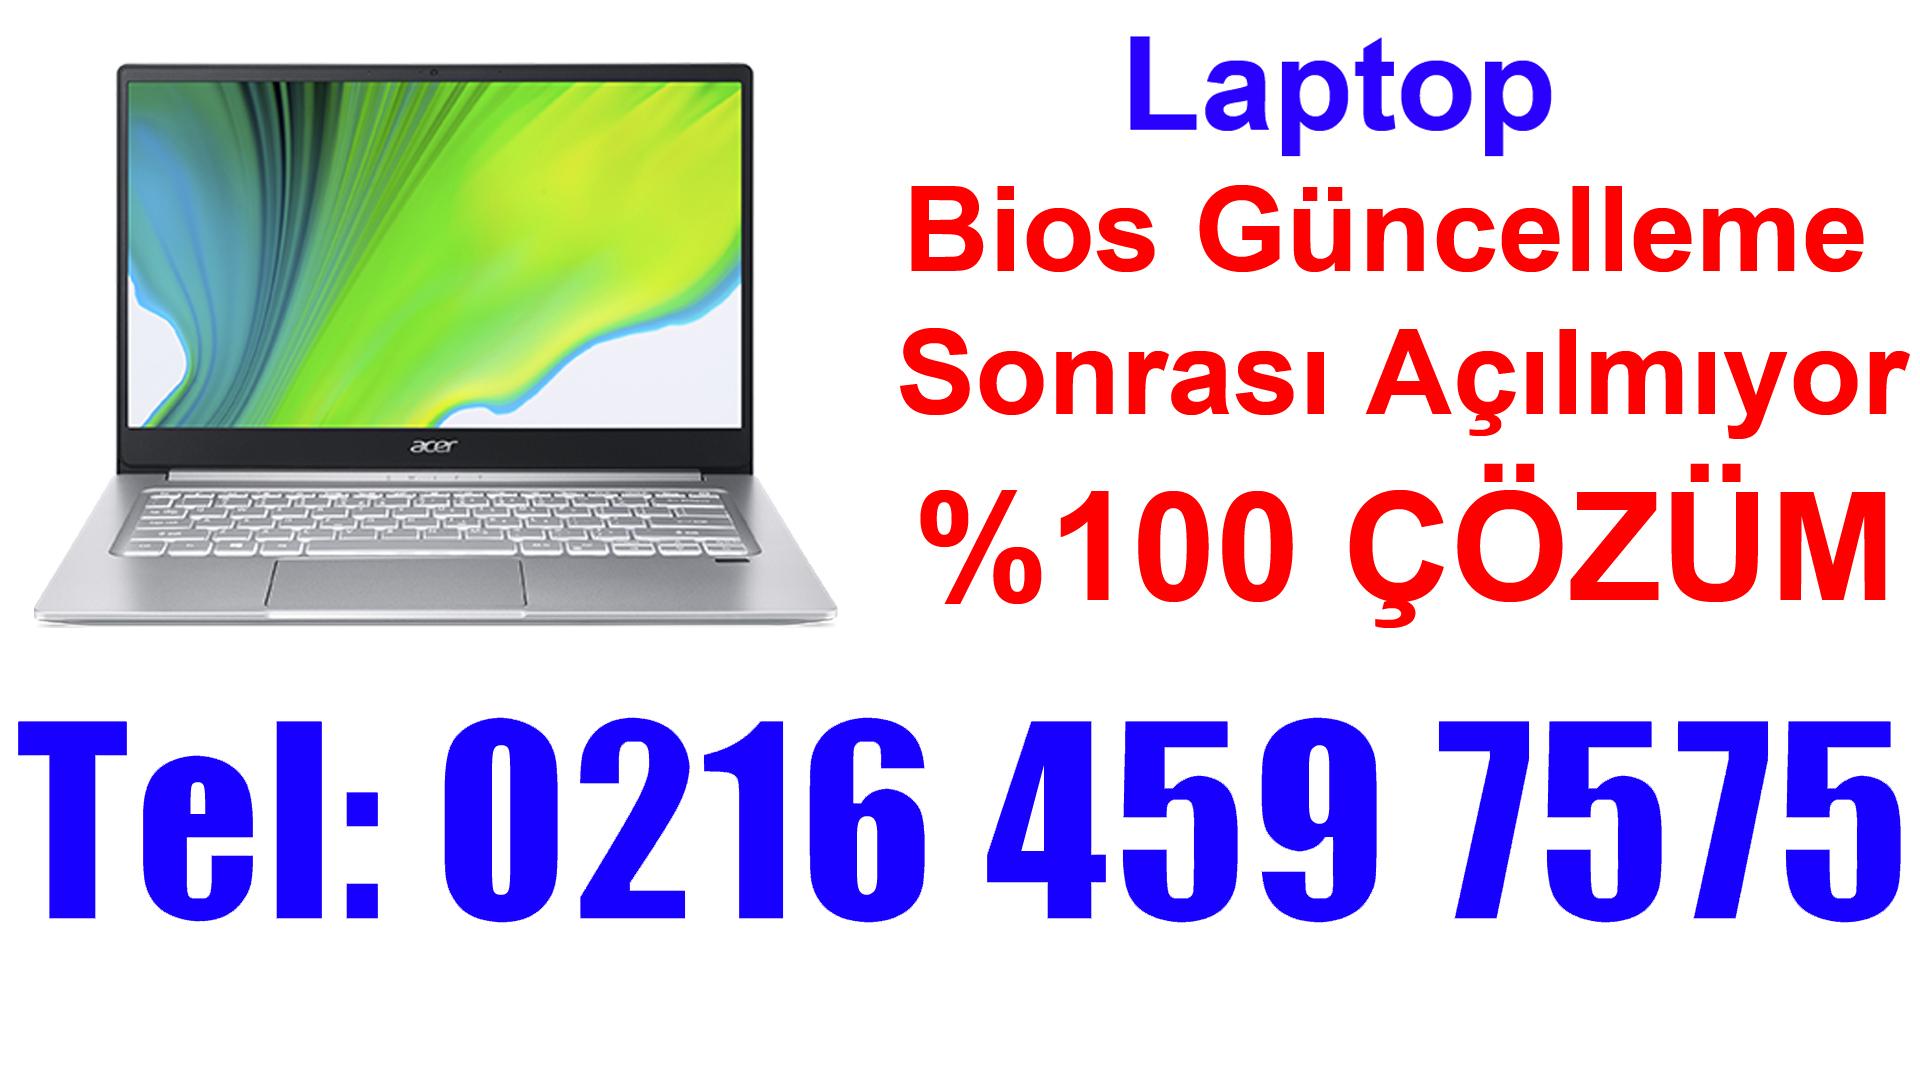 Freedos Laptopa Windows 10 Yükleme